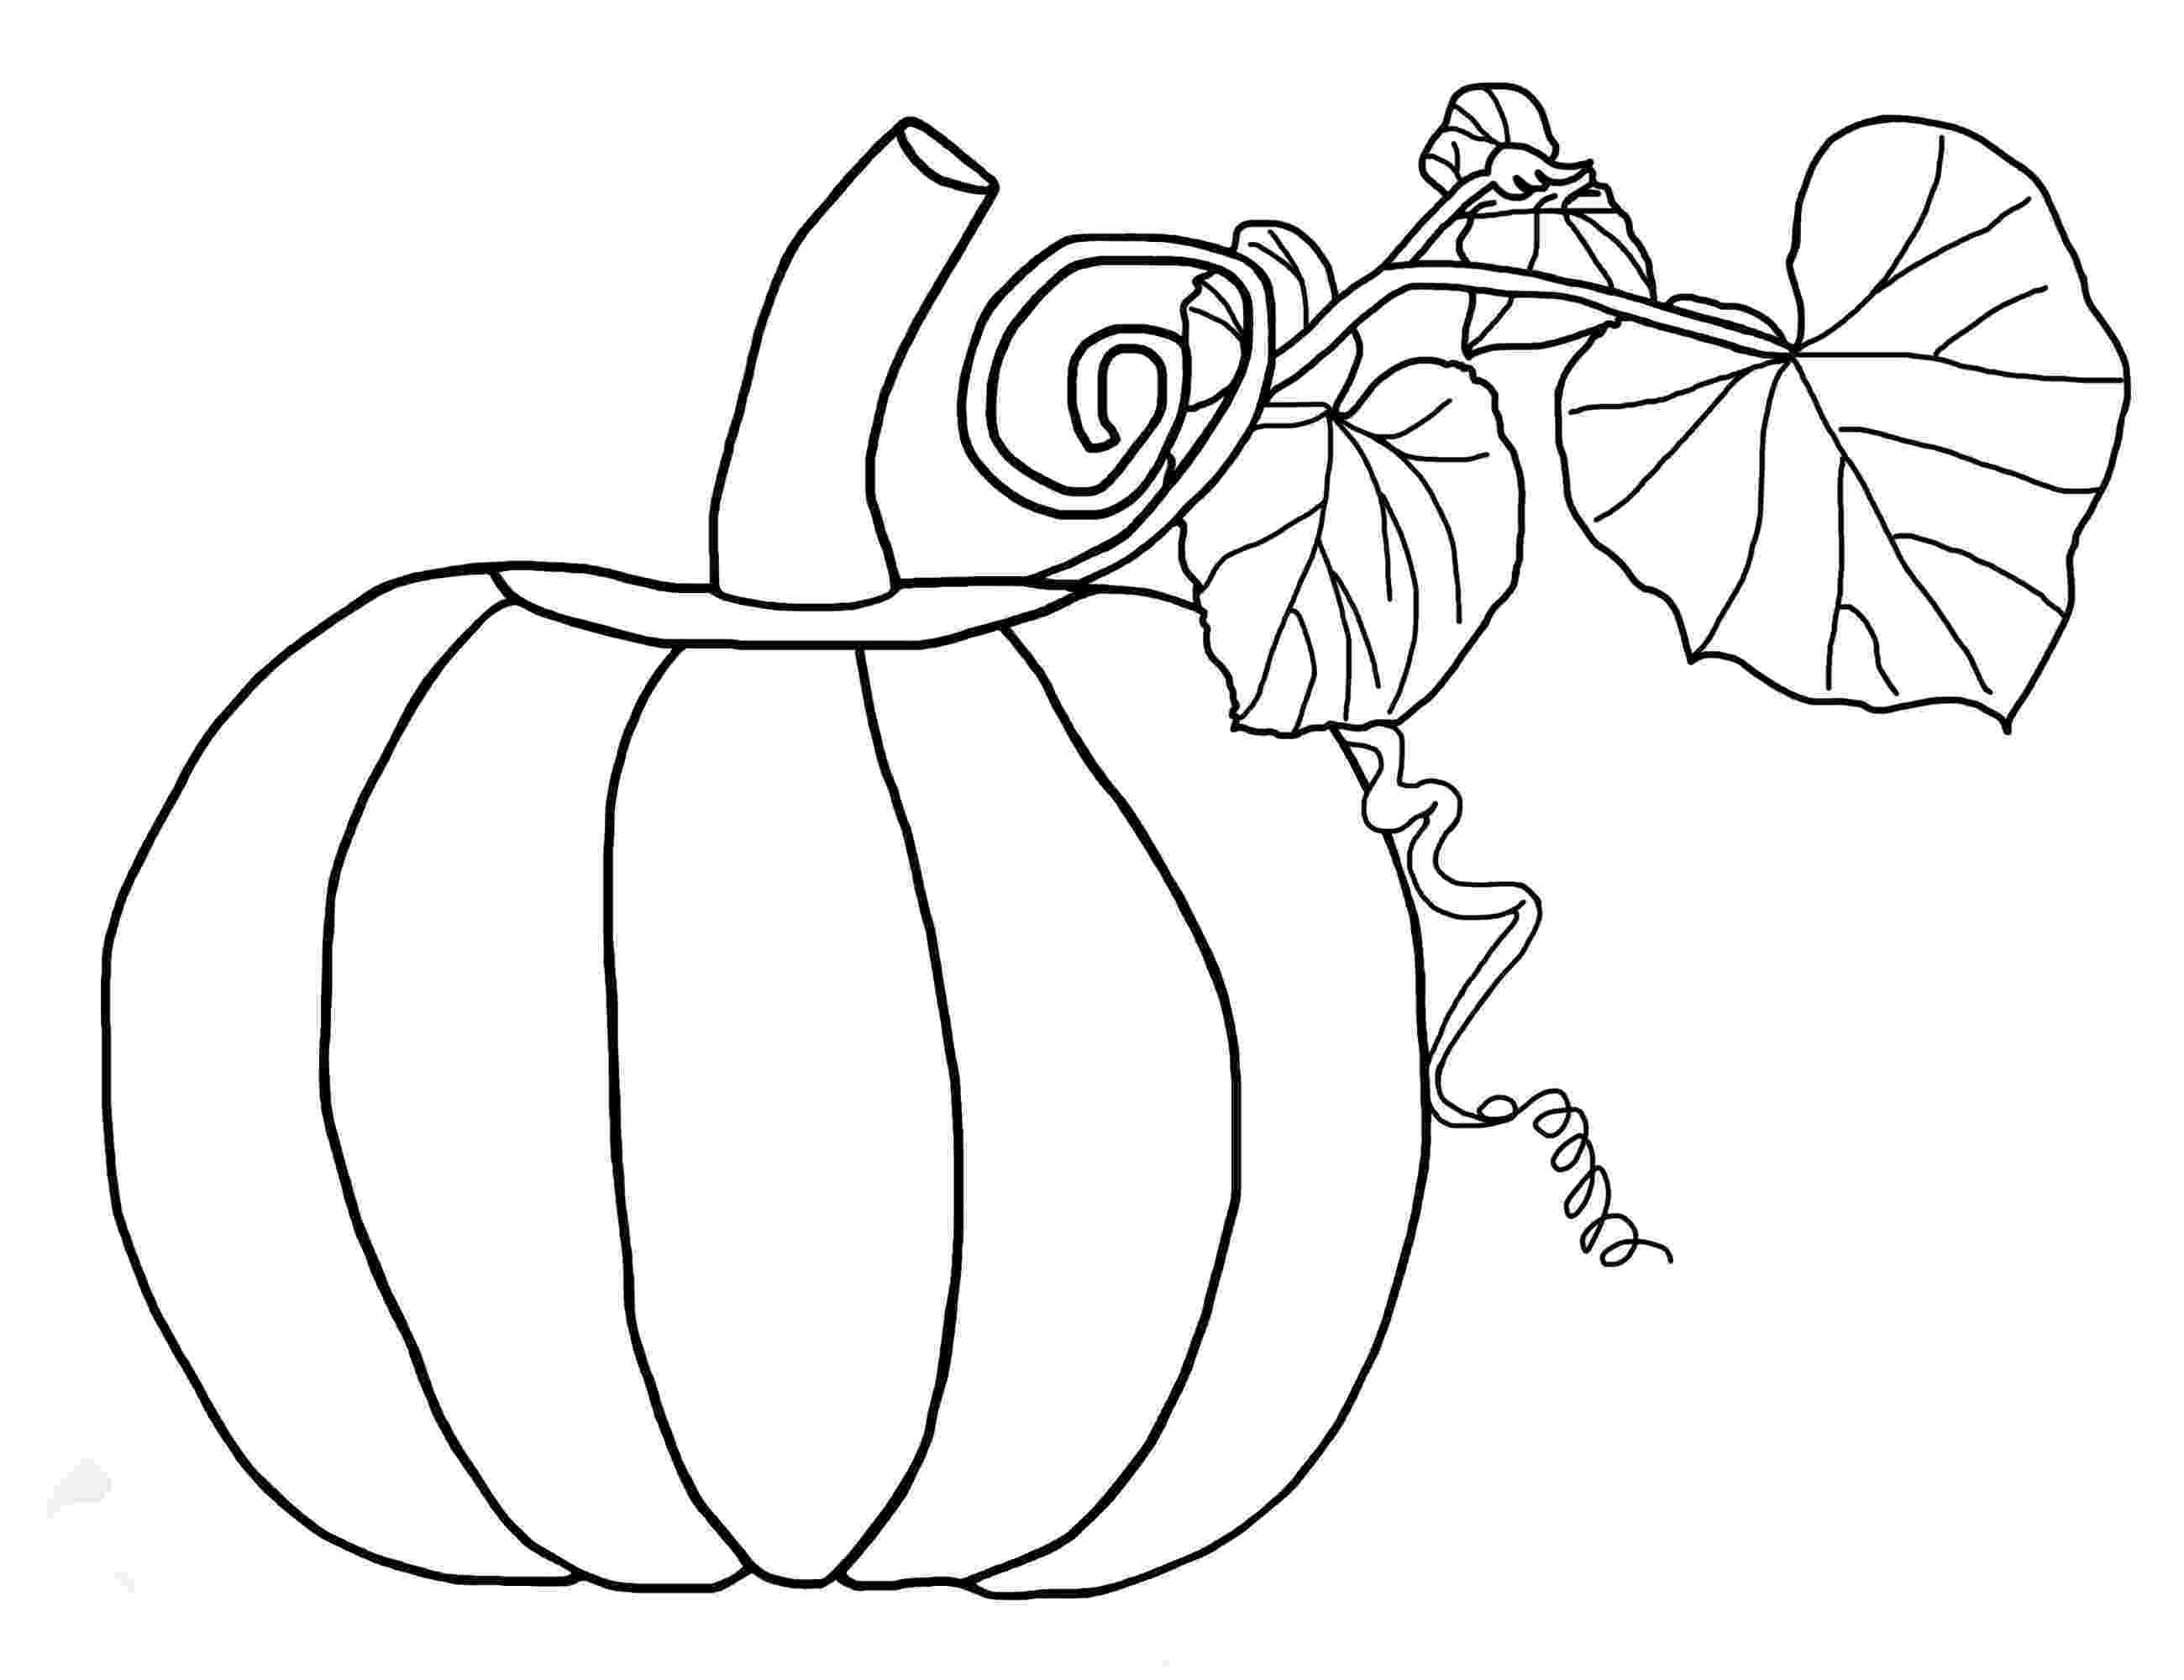 pumpkin color pages printable free printable pumpkin coloring pages for kids pumpkin printable pages color